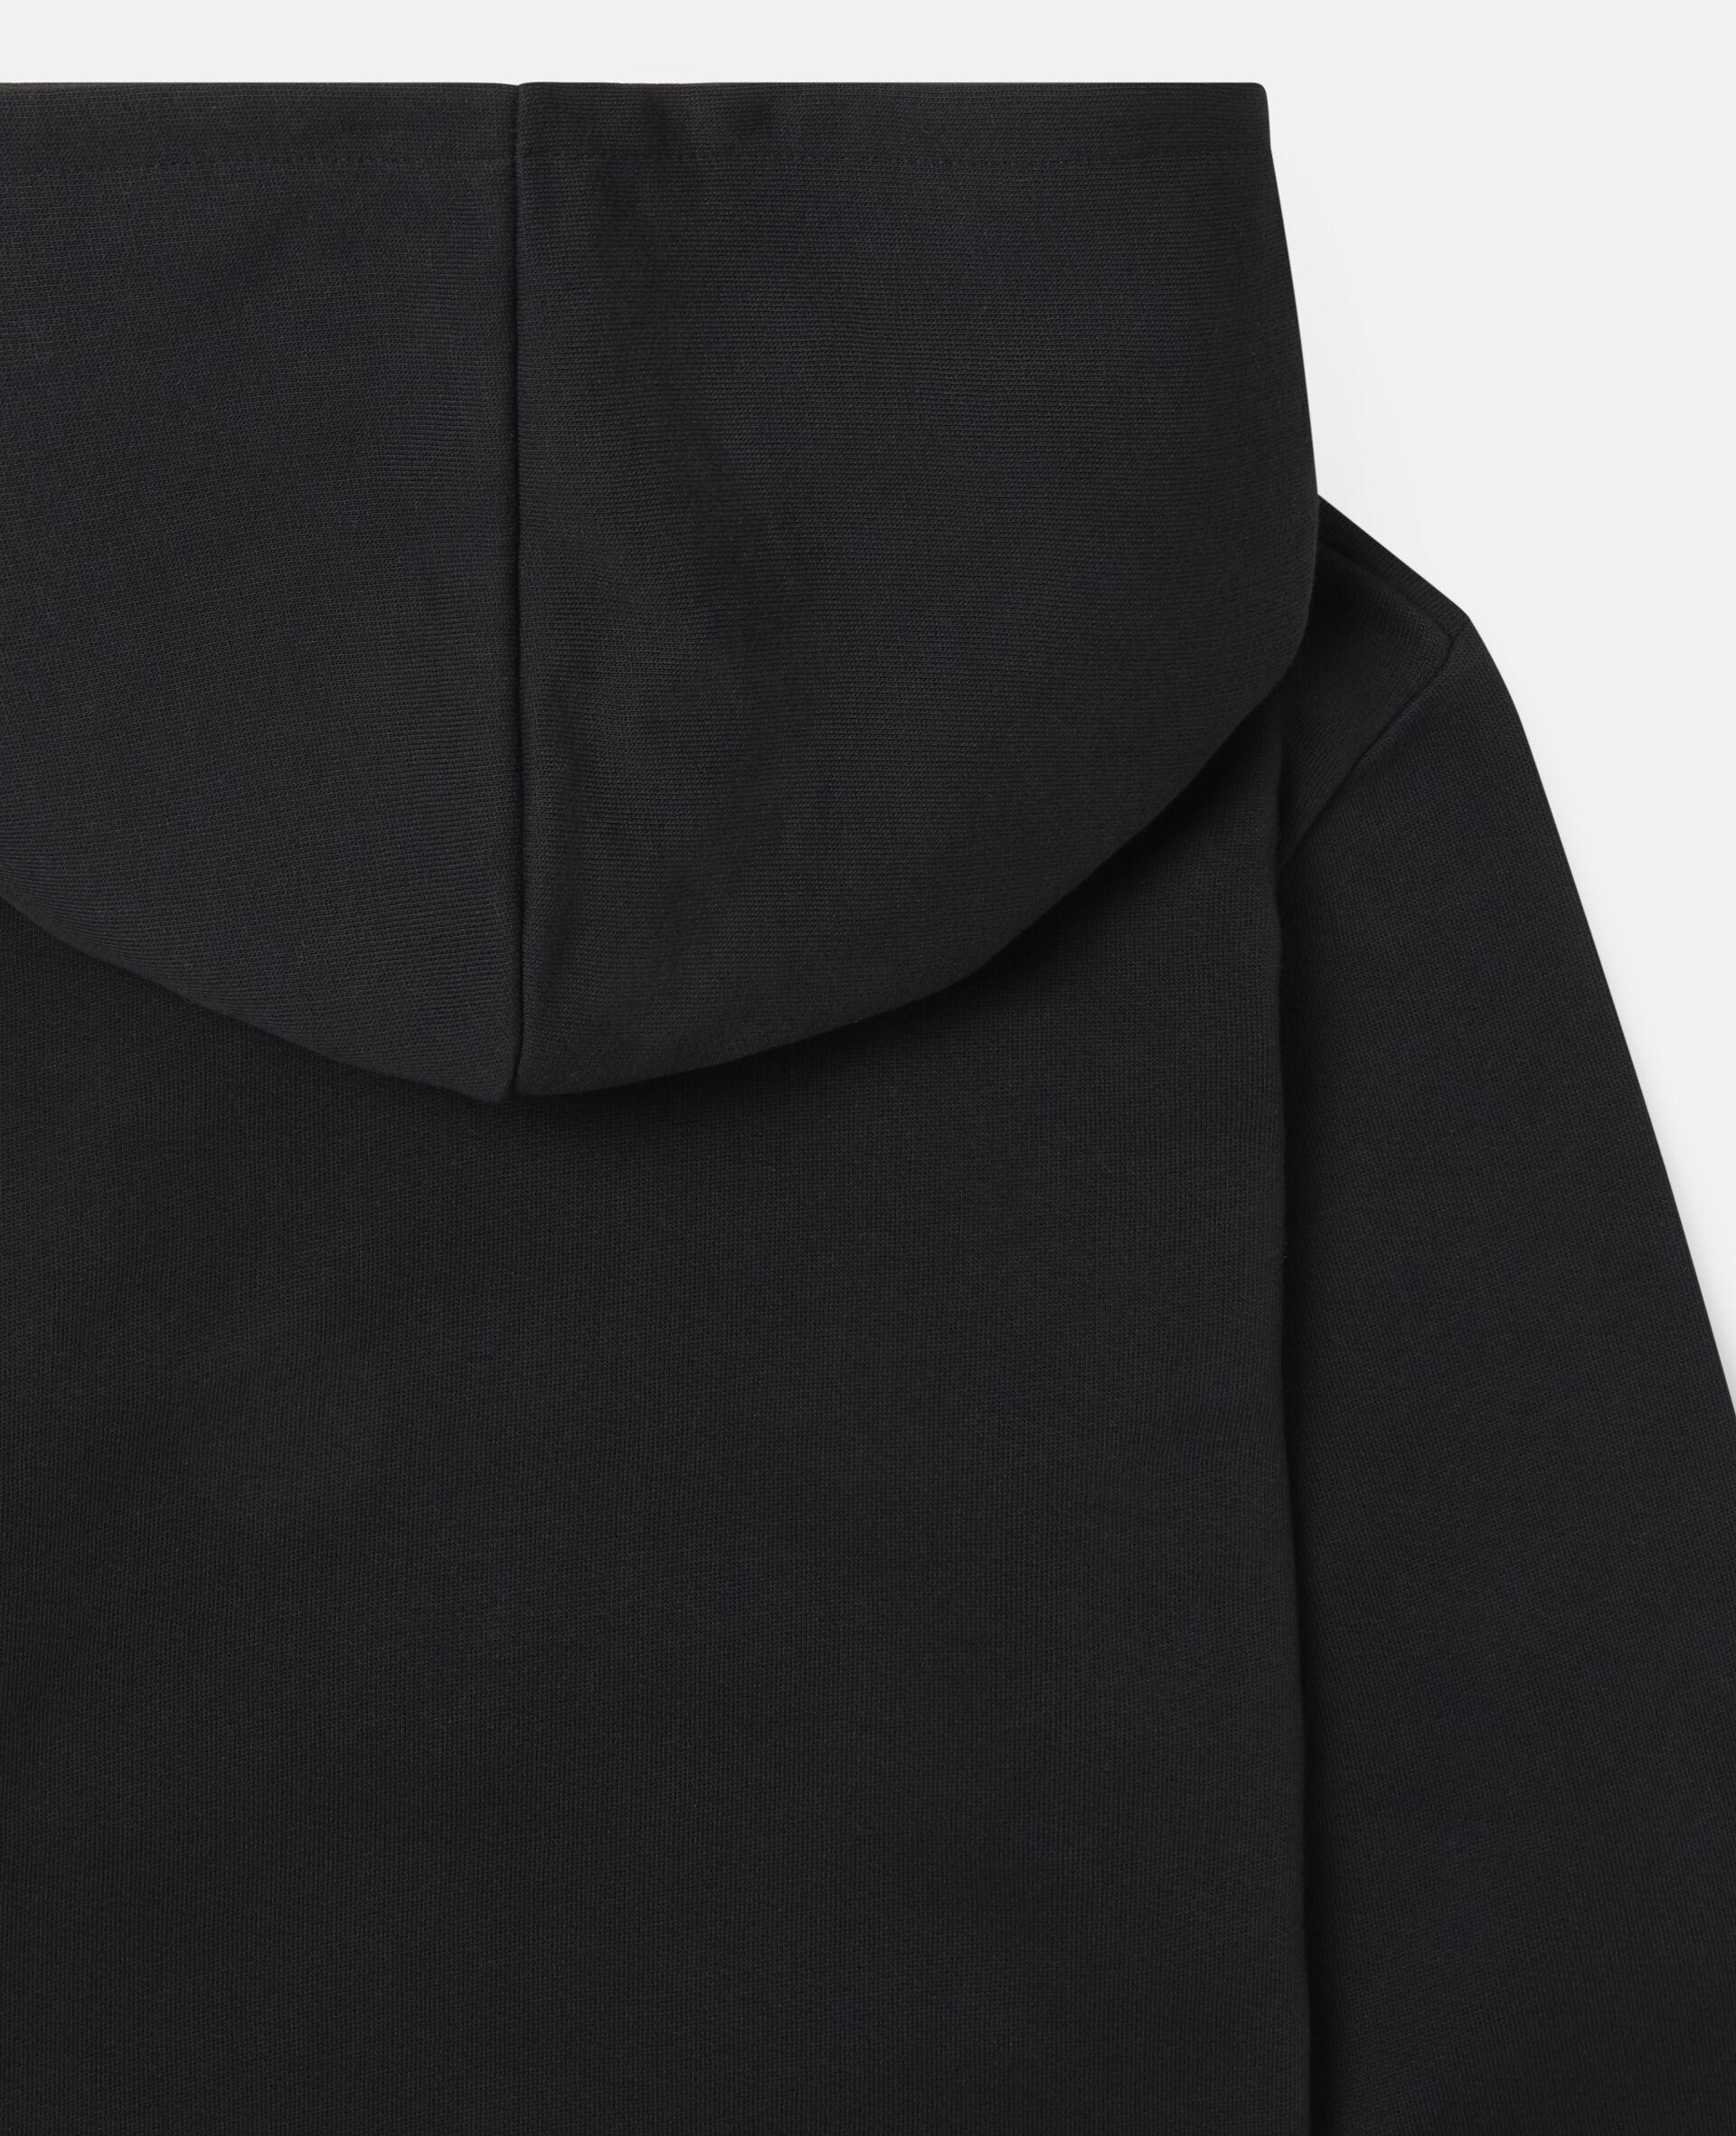 Oversized Graphic Mountain Fleece Hoodie-Black-large image number 2